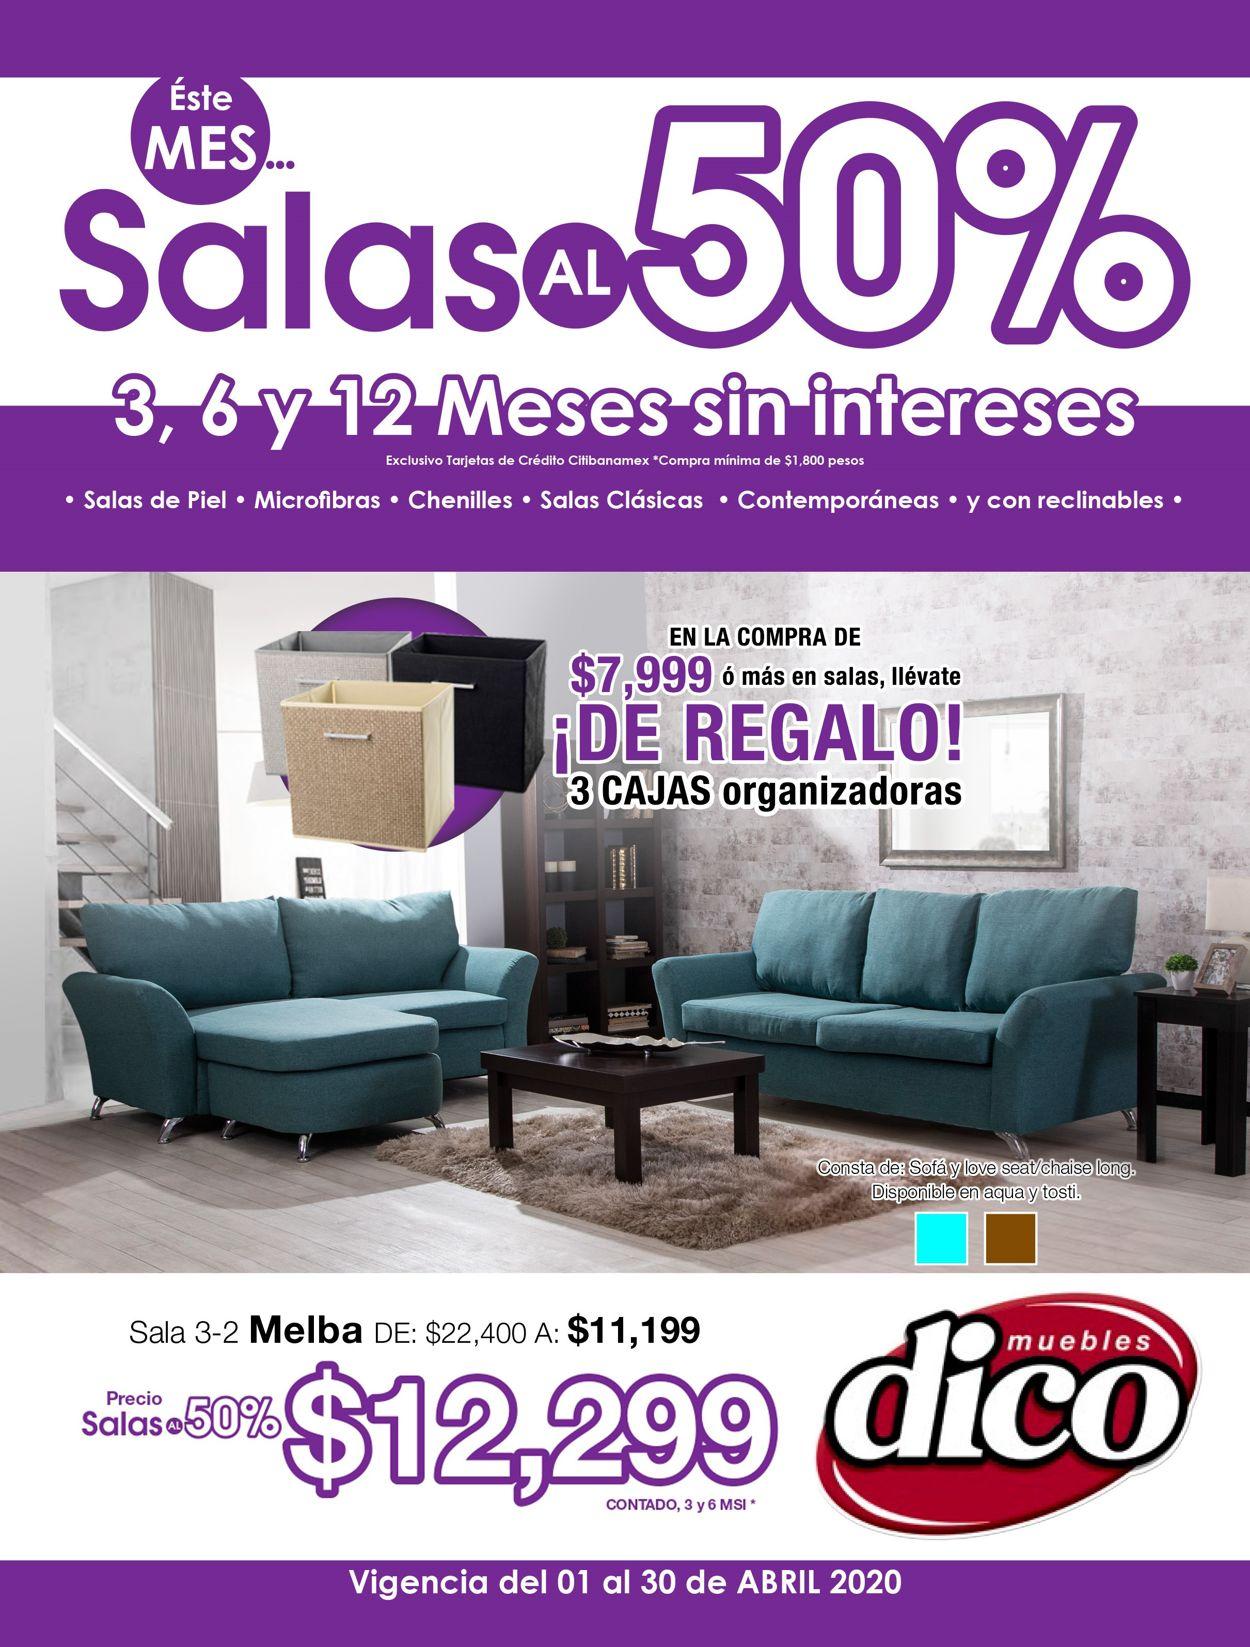 Muebles Dico Folleto - 01.04-30.04.2020